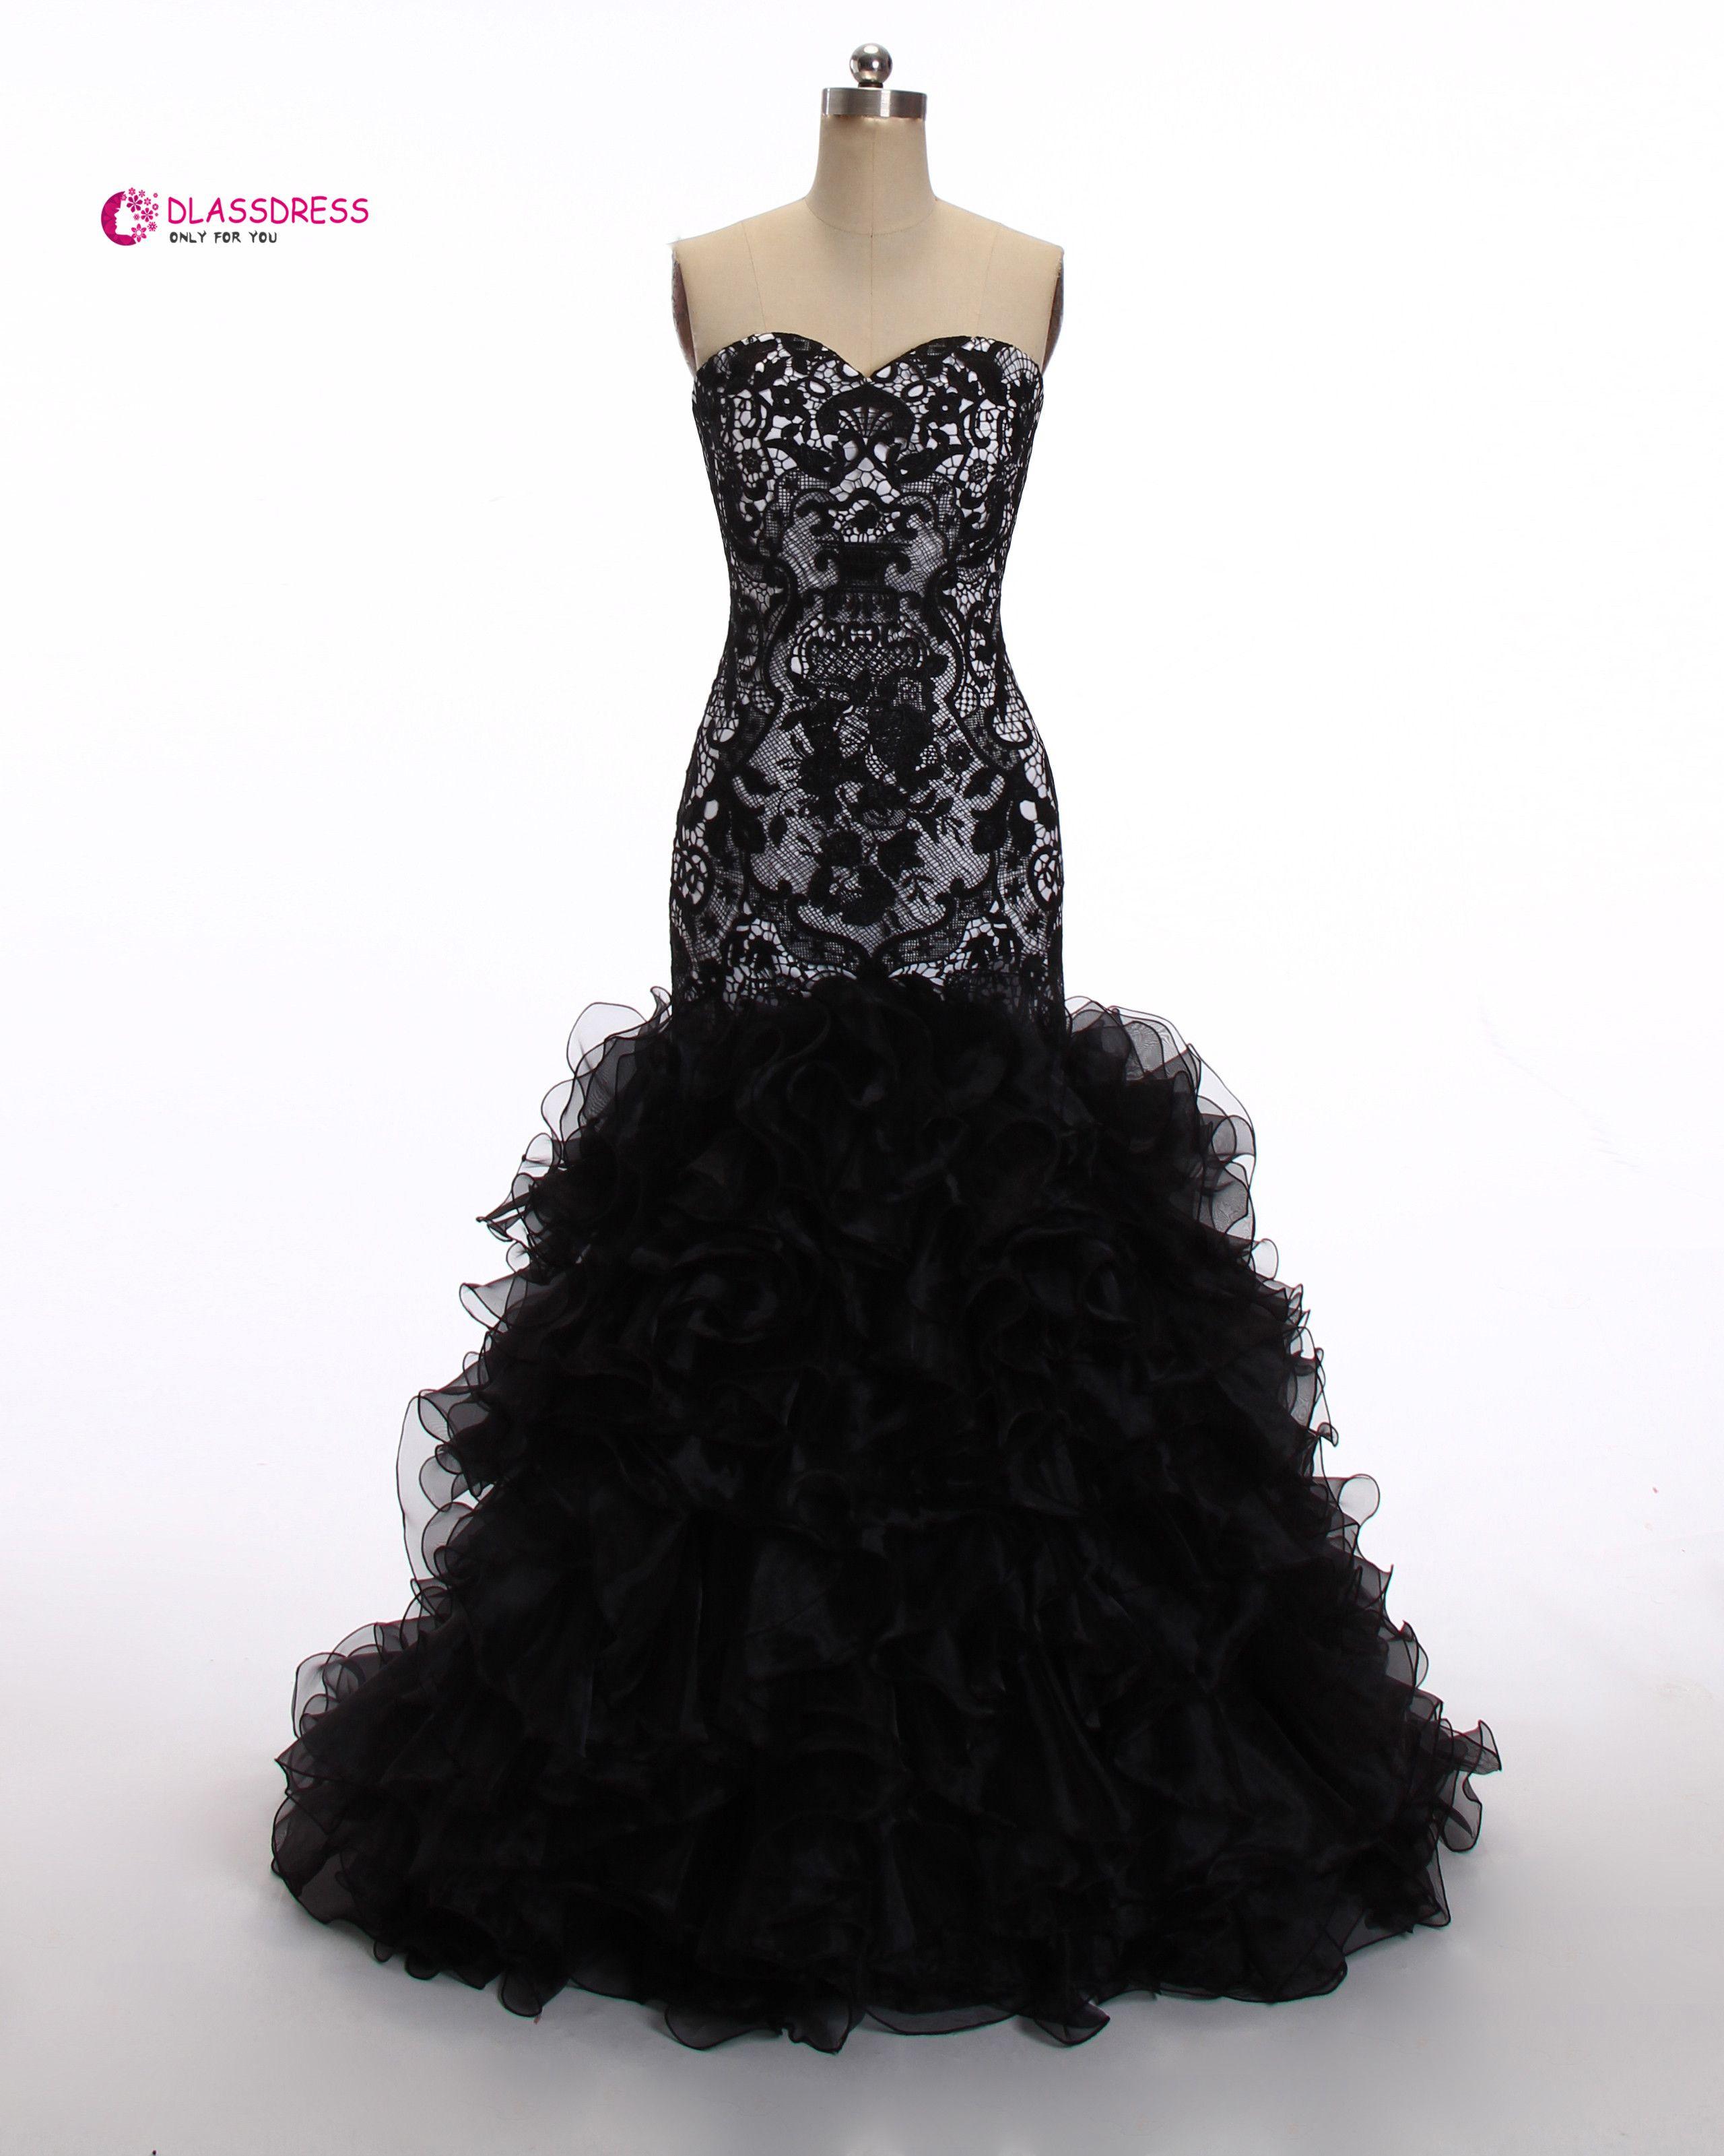 Heart Shaped Strapless Prom Dresses